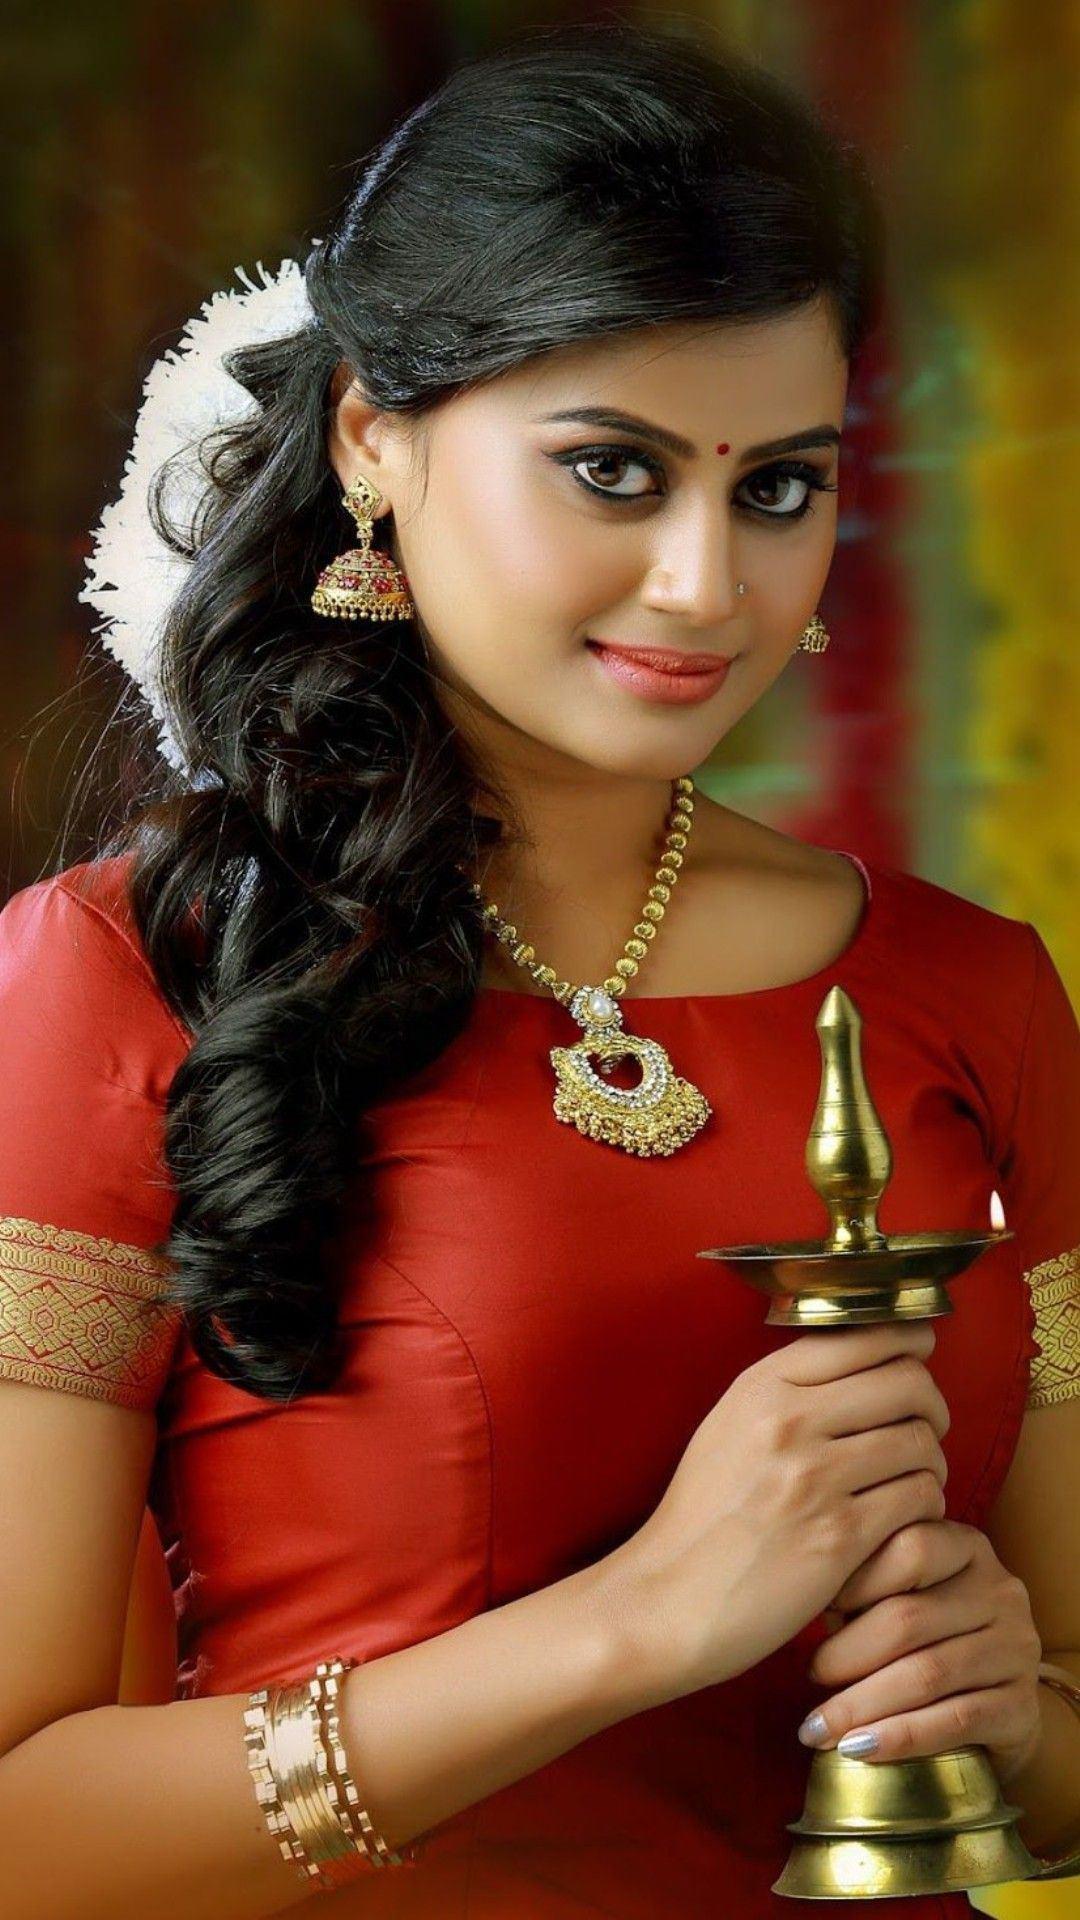 best of Hot Kerala photos girls black